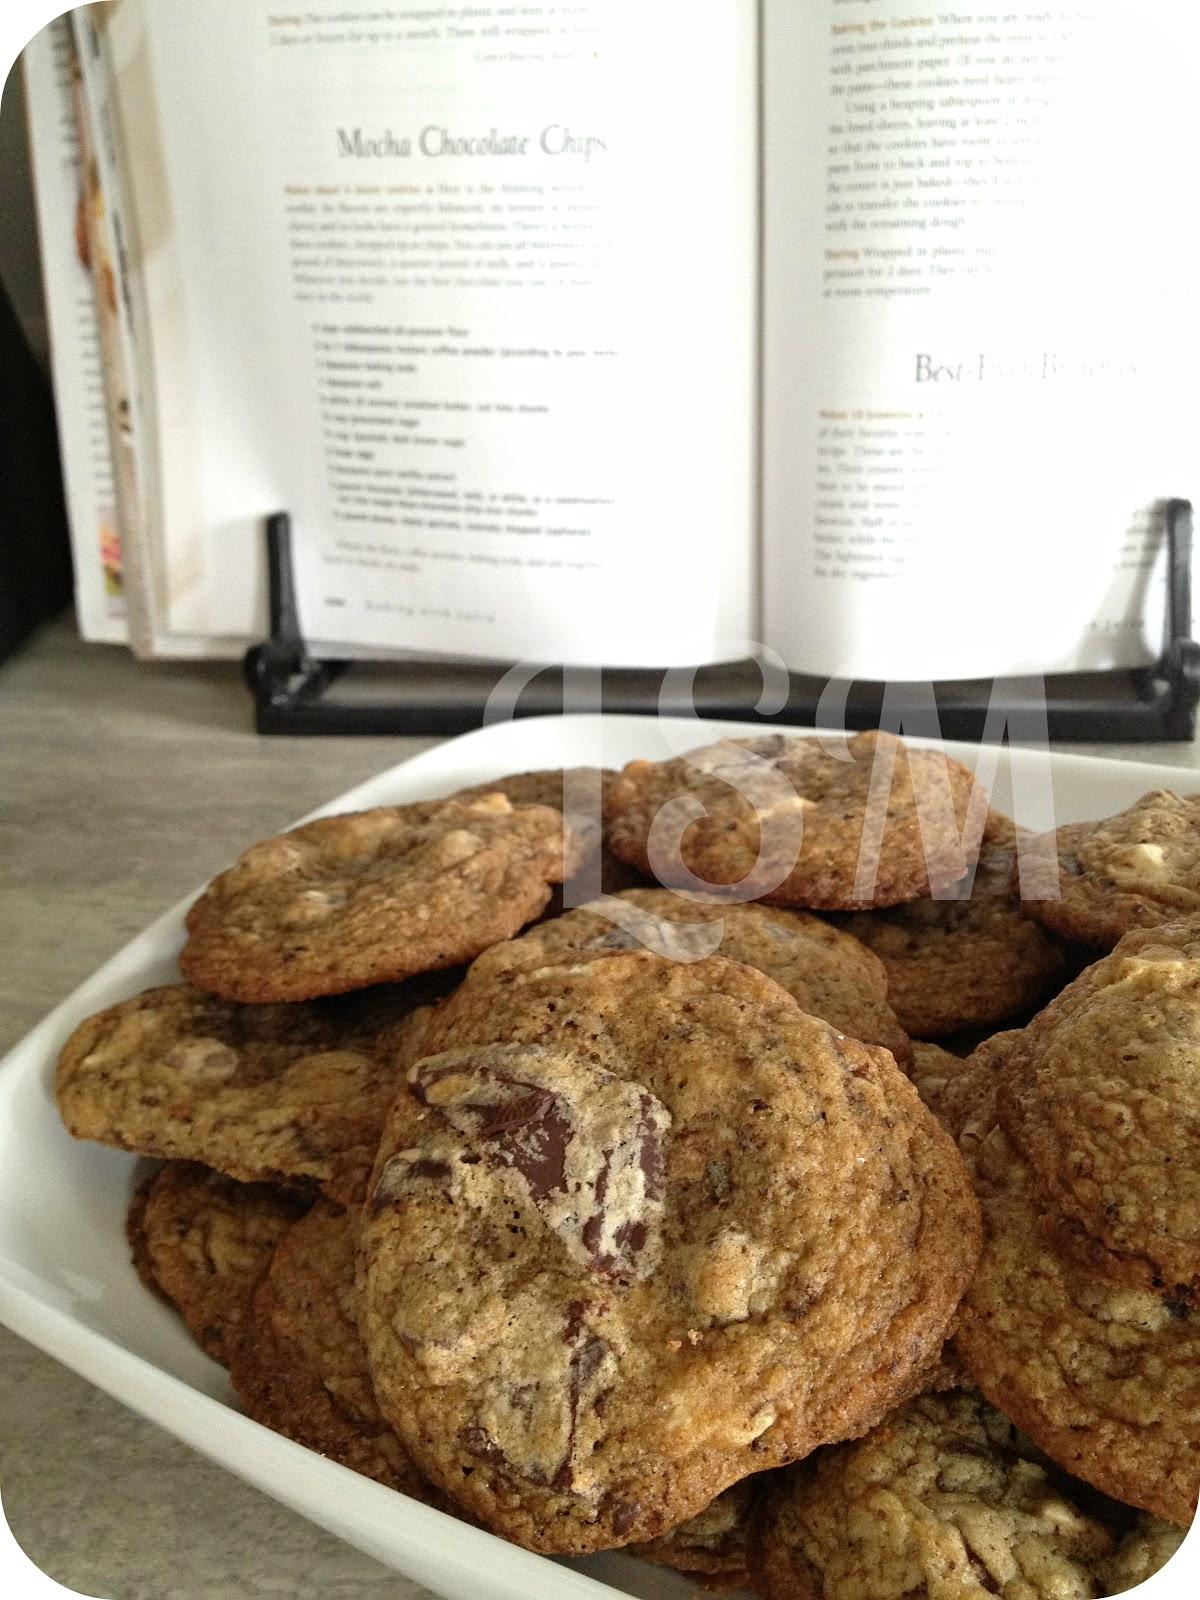 Mocha Chocolate Chip Cookies Baking With Julia